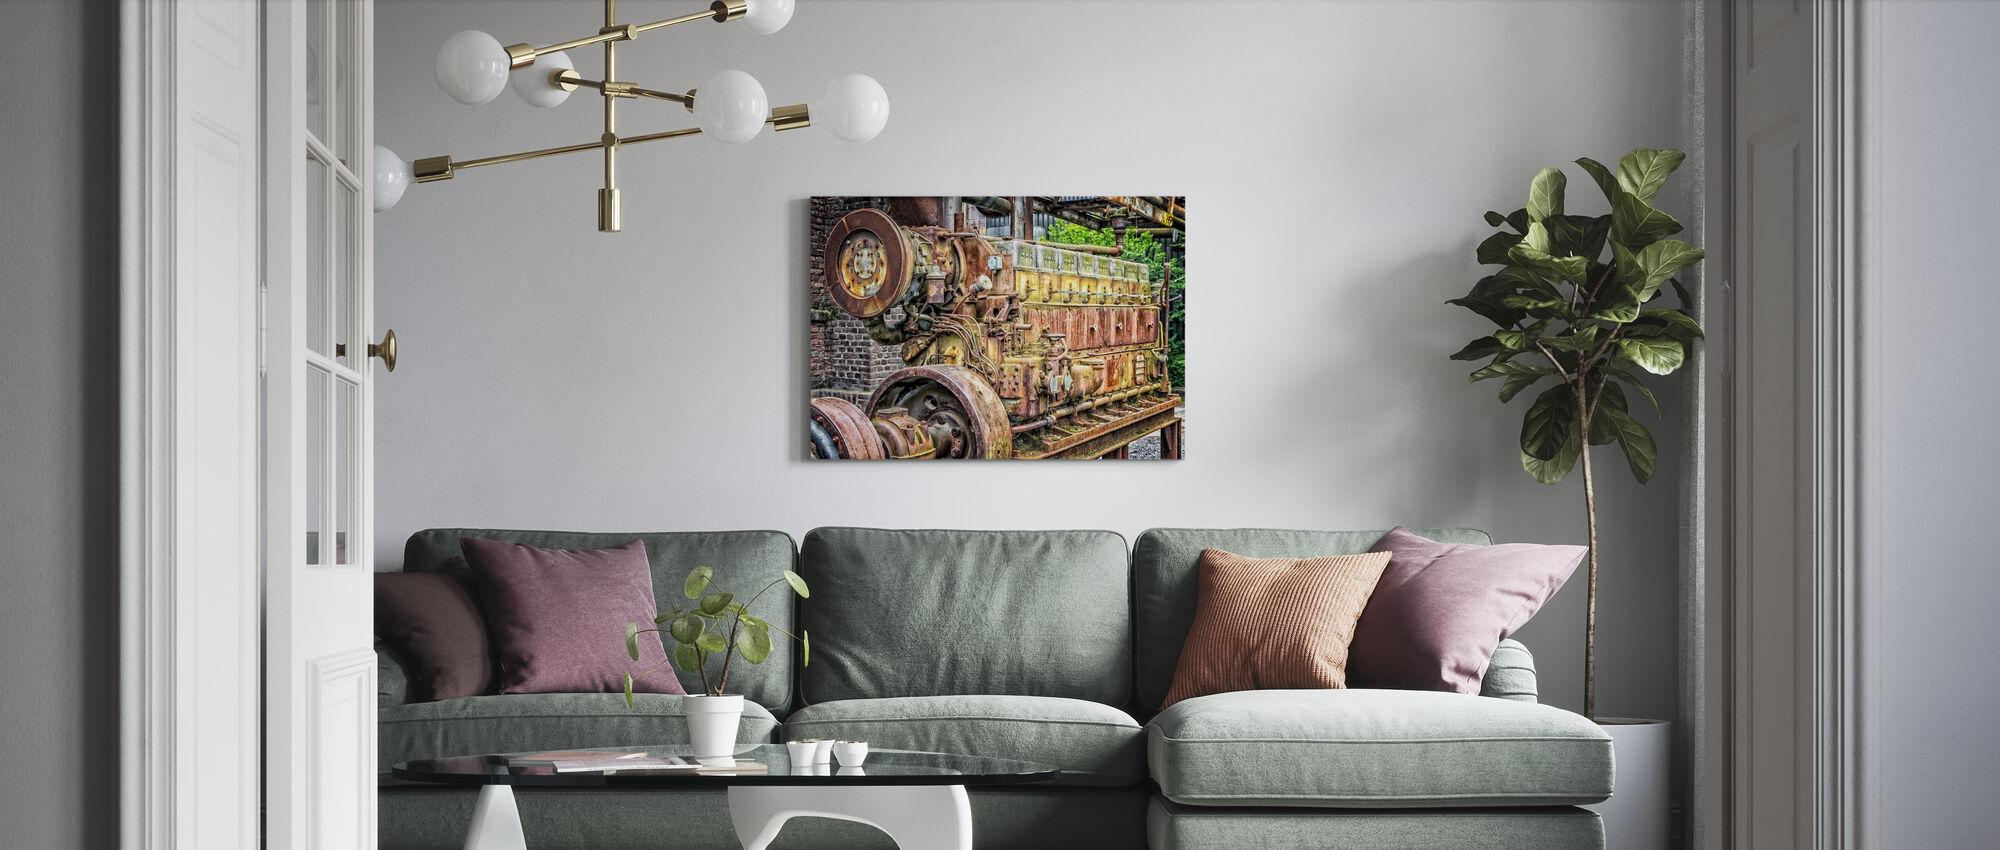 Rusty Machine Motor - Canvas print - Living Room